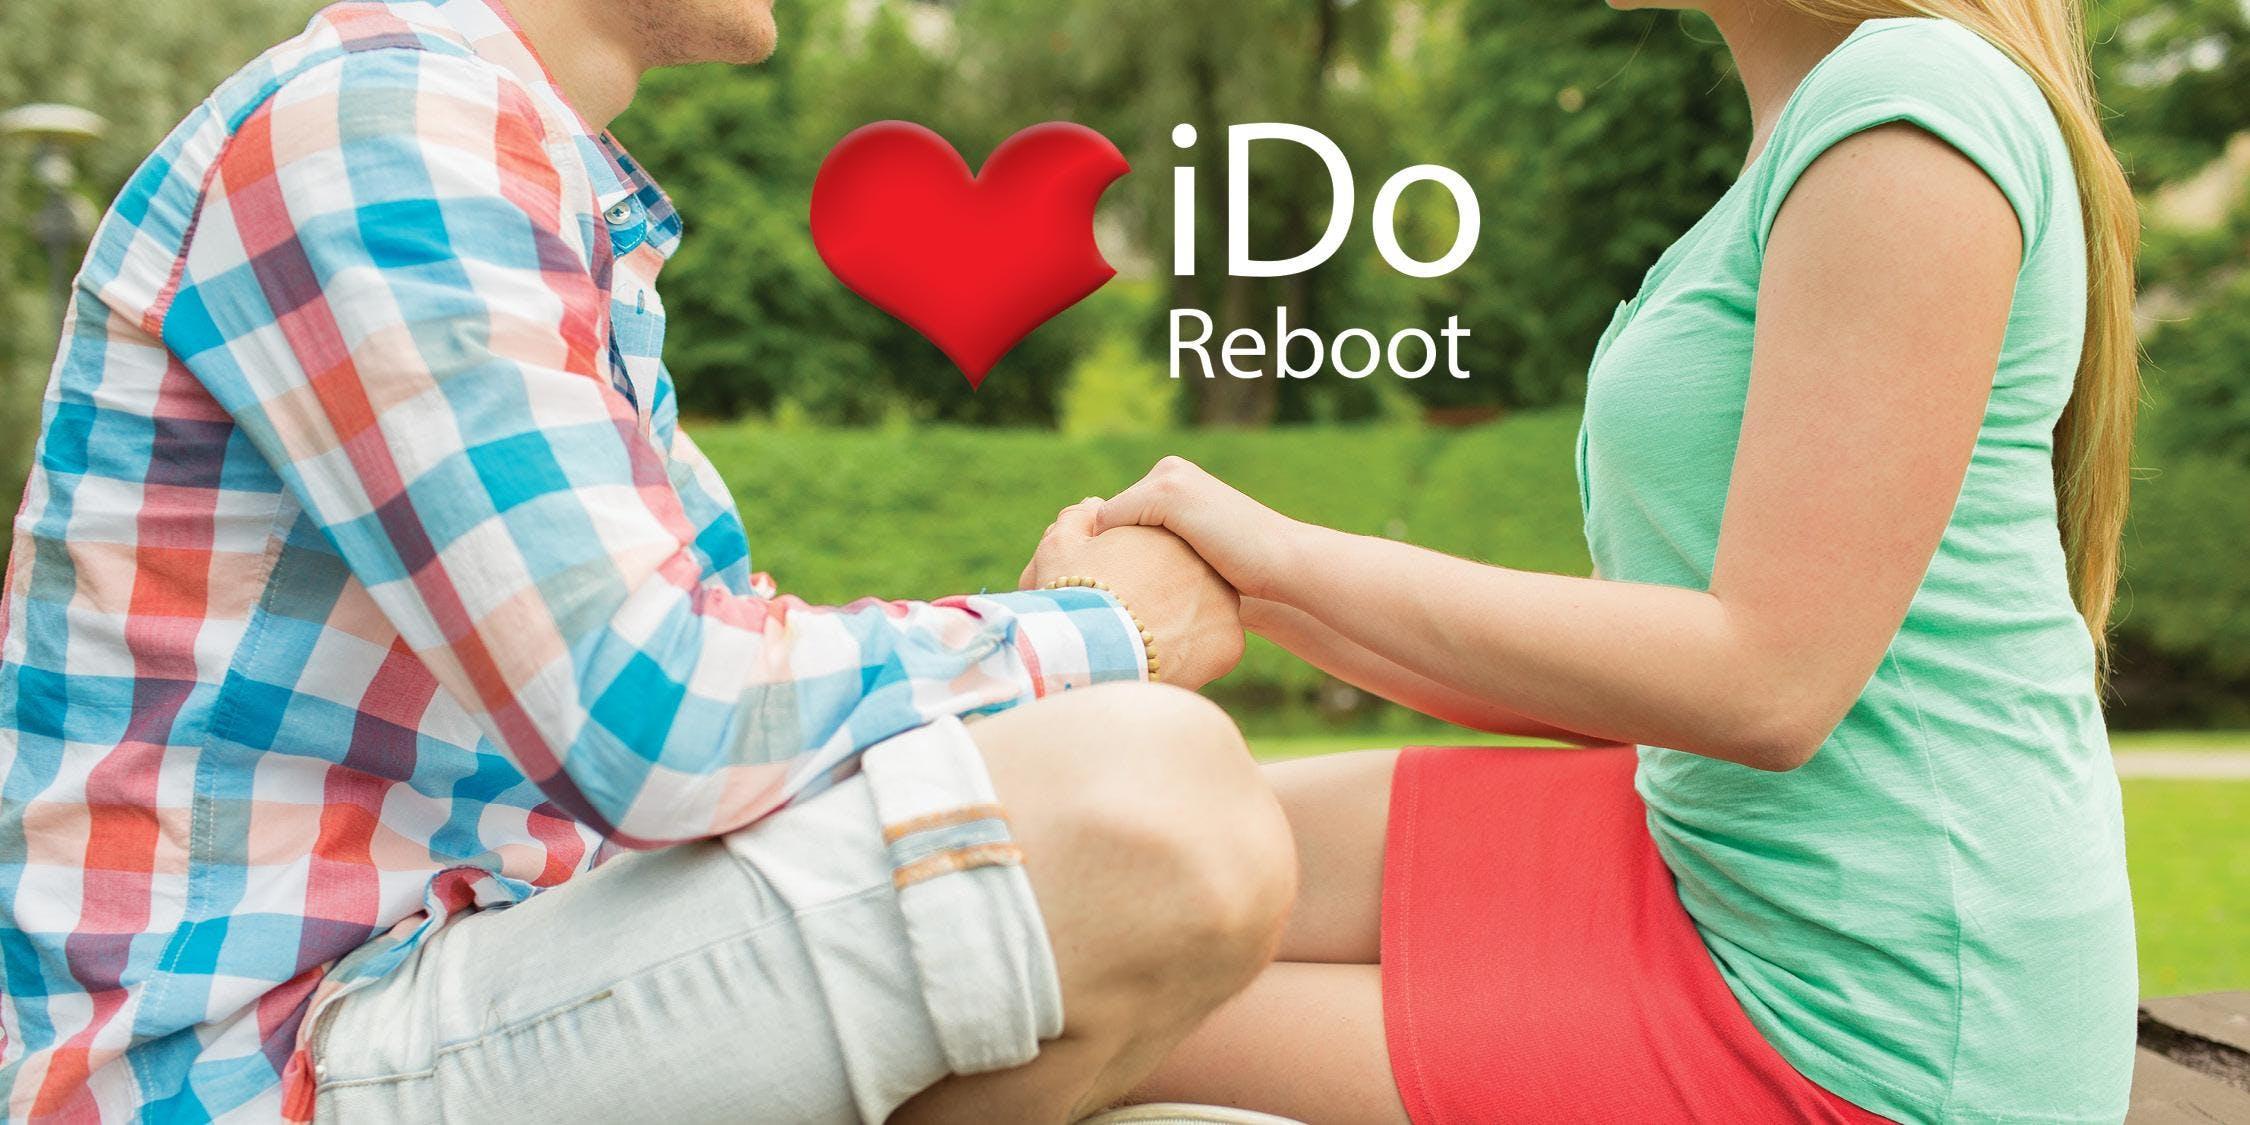 iDo Reboot - A Marriage Seminar